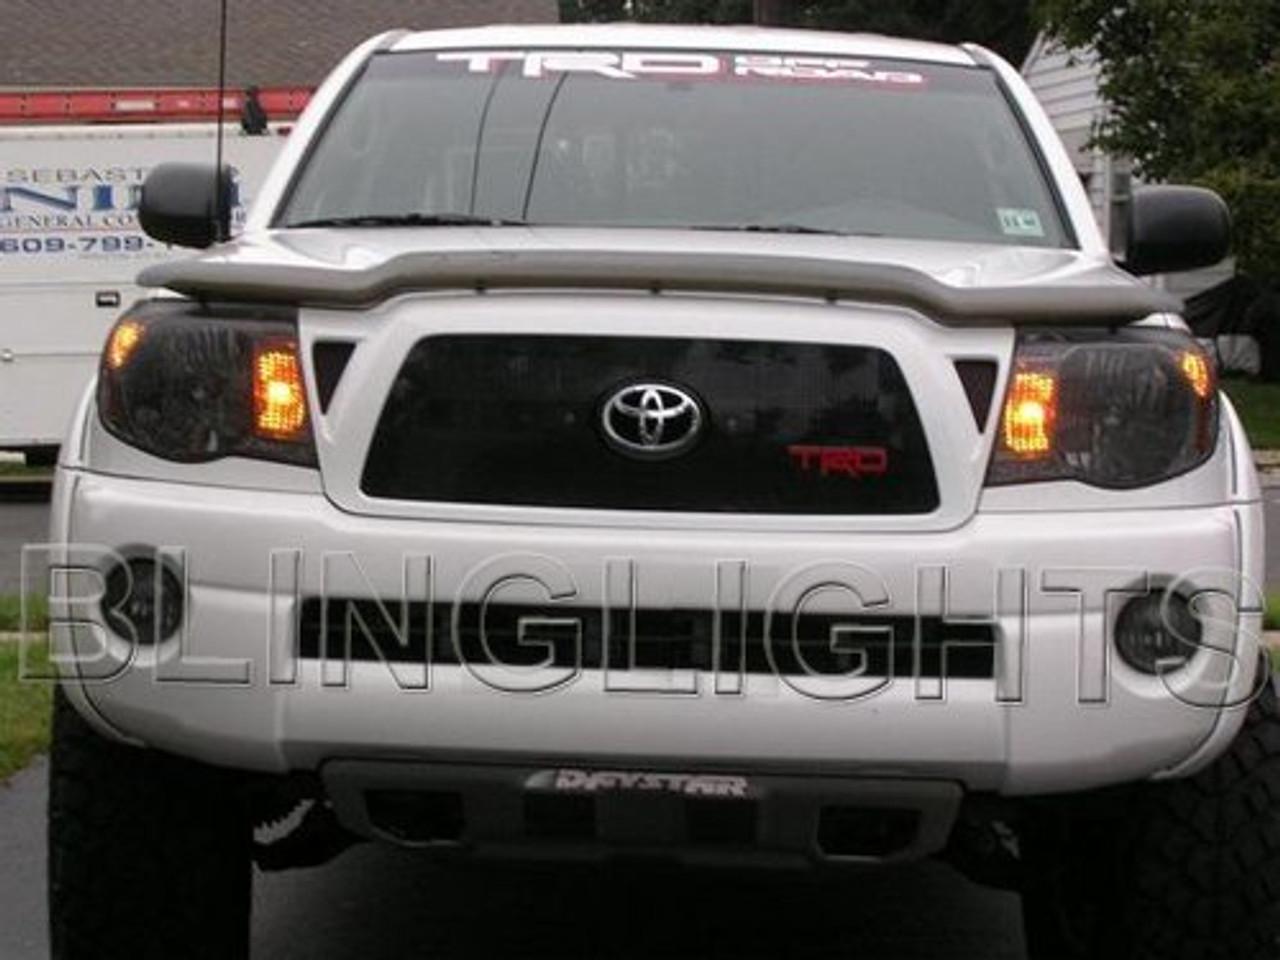 2005 2006 2007 2008 2009 2010 Toyota Tacoma Fog Lamps Tint Lights Films Smoked Lense Protection